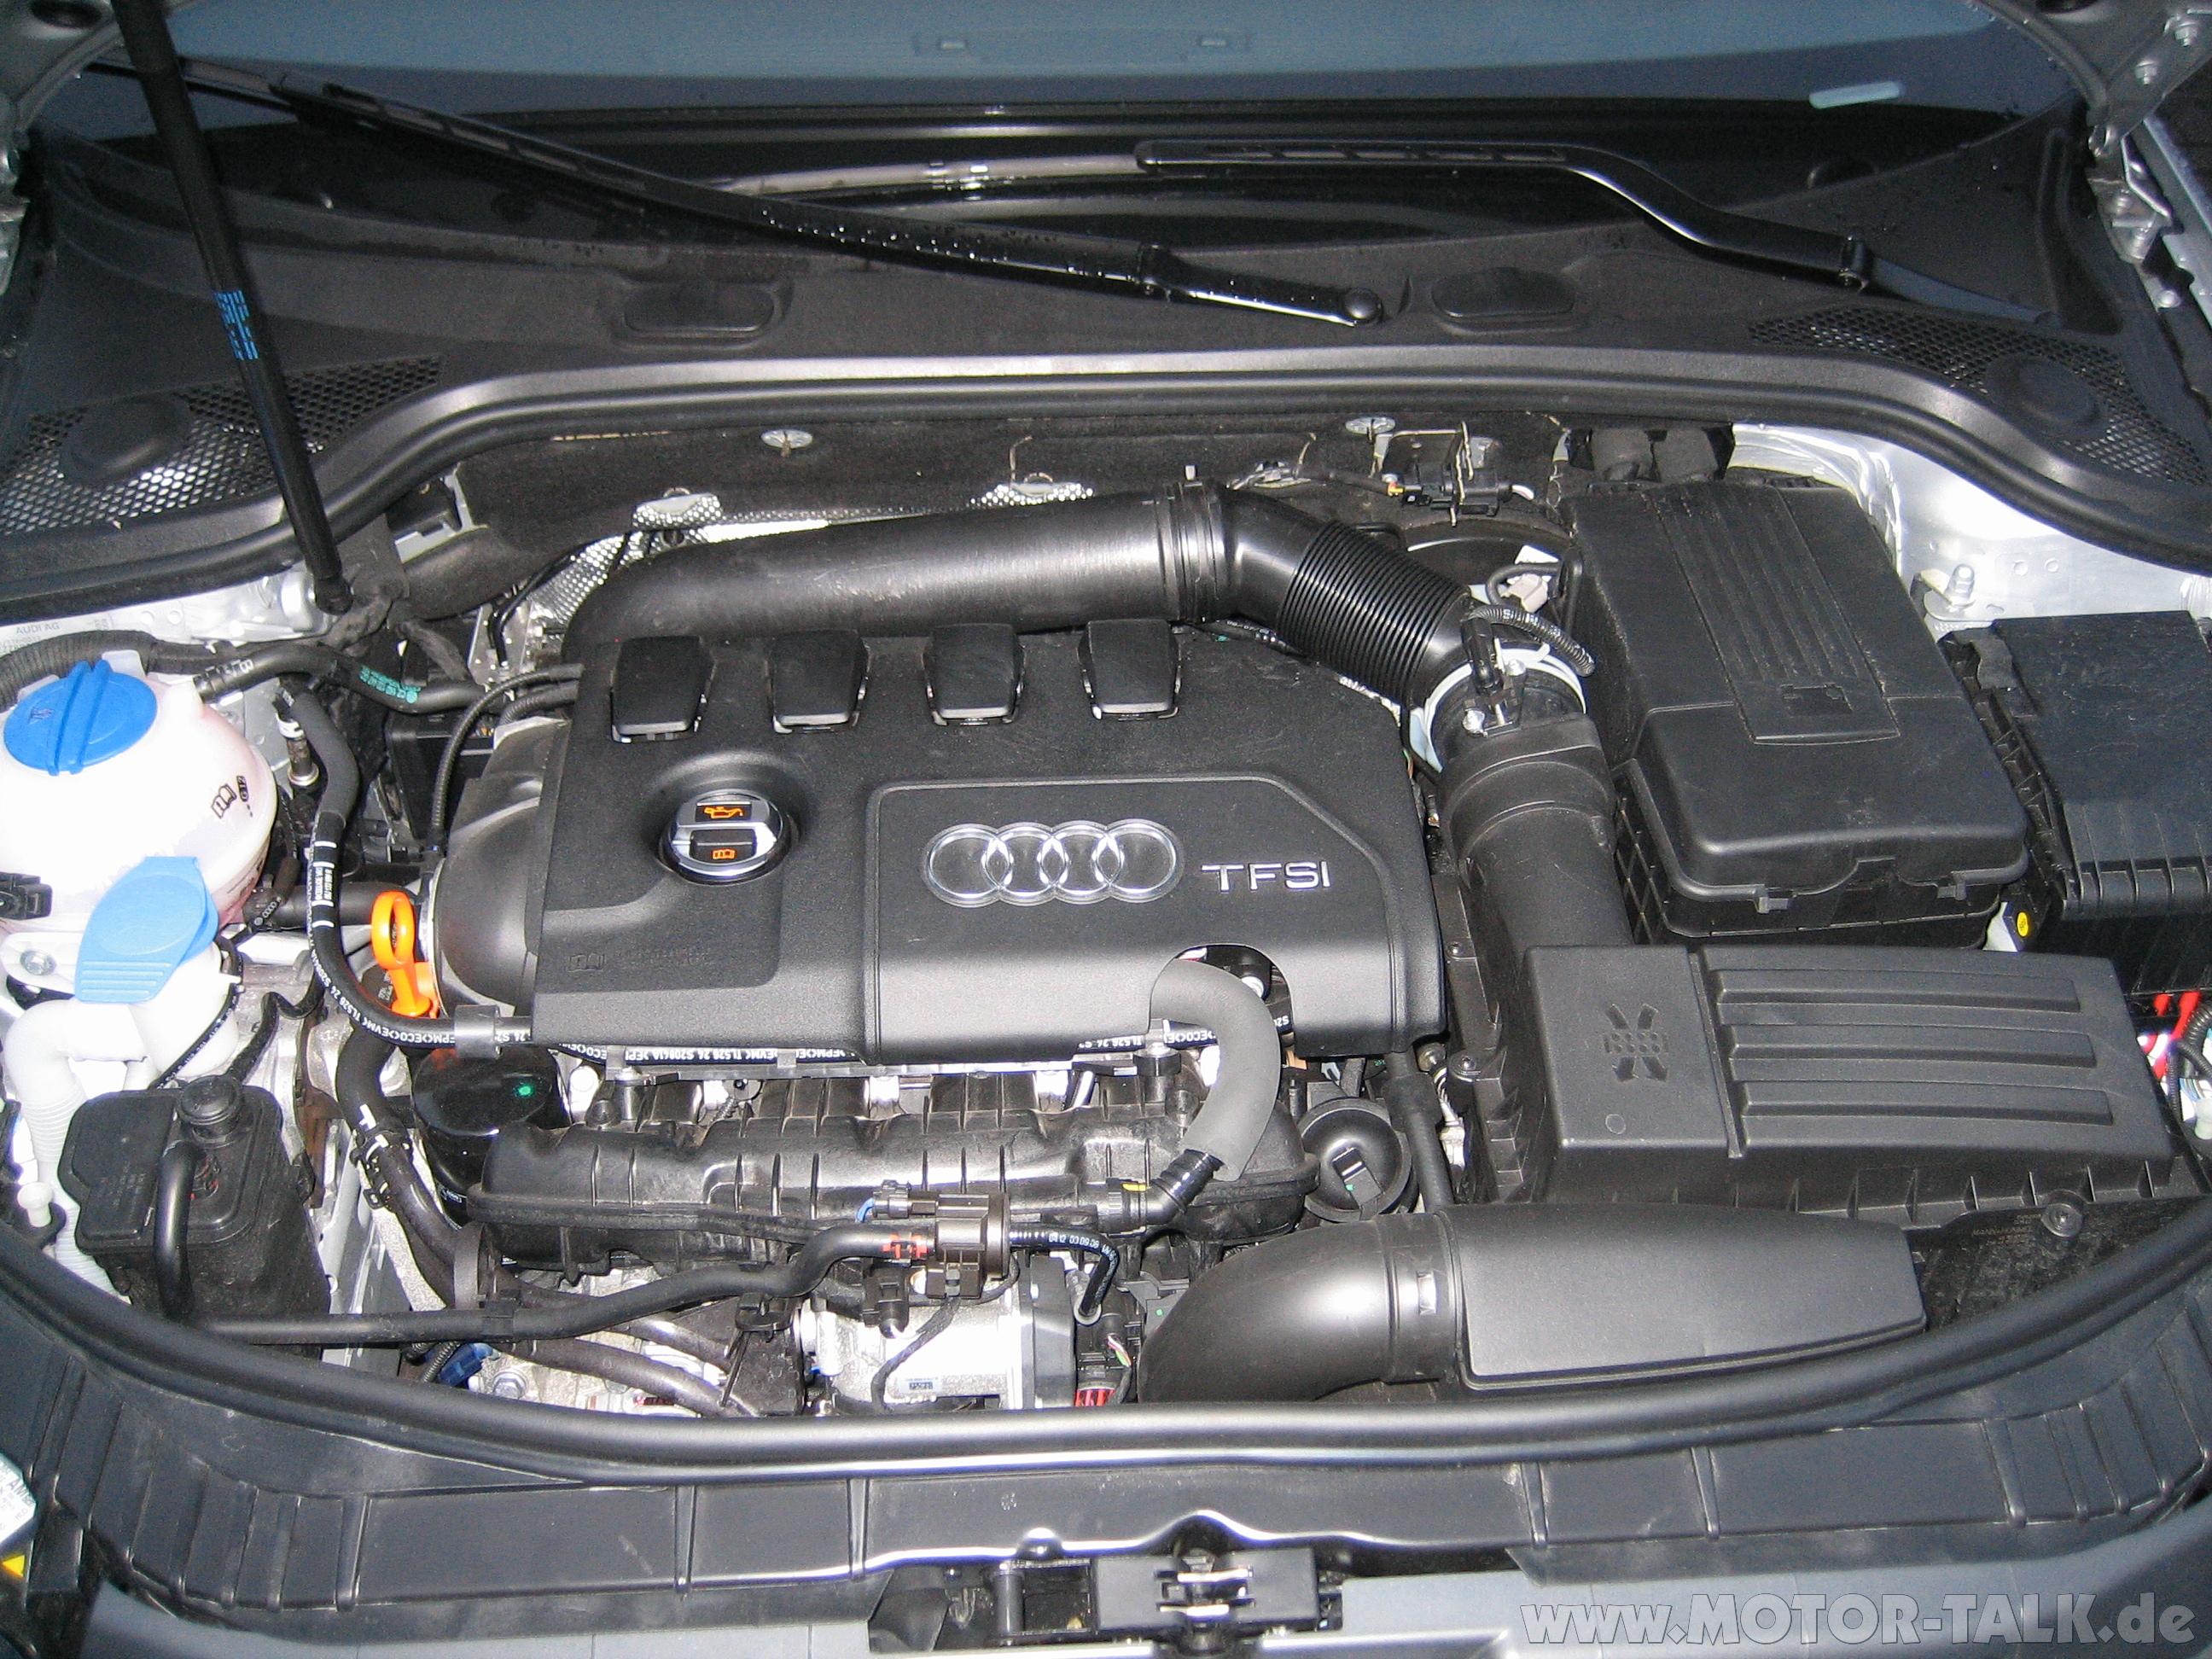 Img 2581 Bilder Vom Motorraum Audi A3 8p 2 00 Fsi Bj